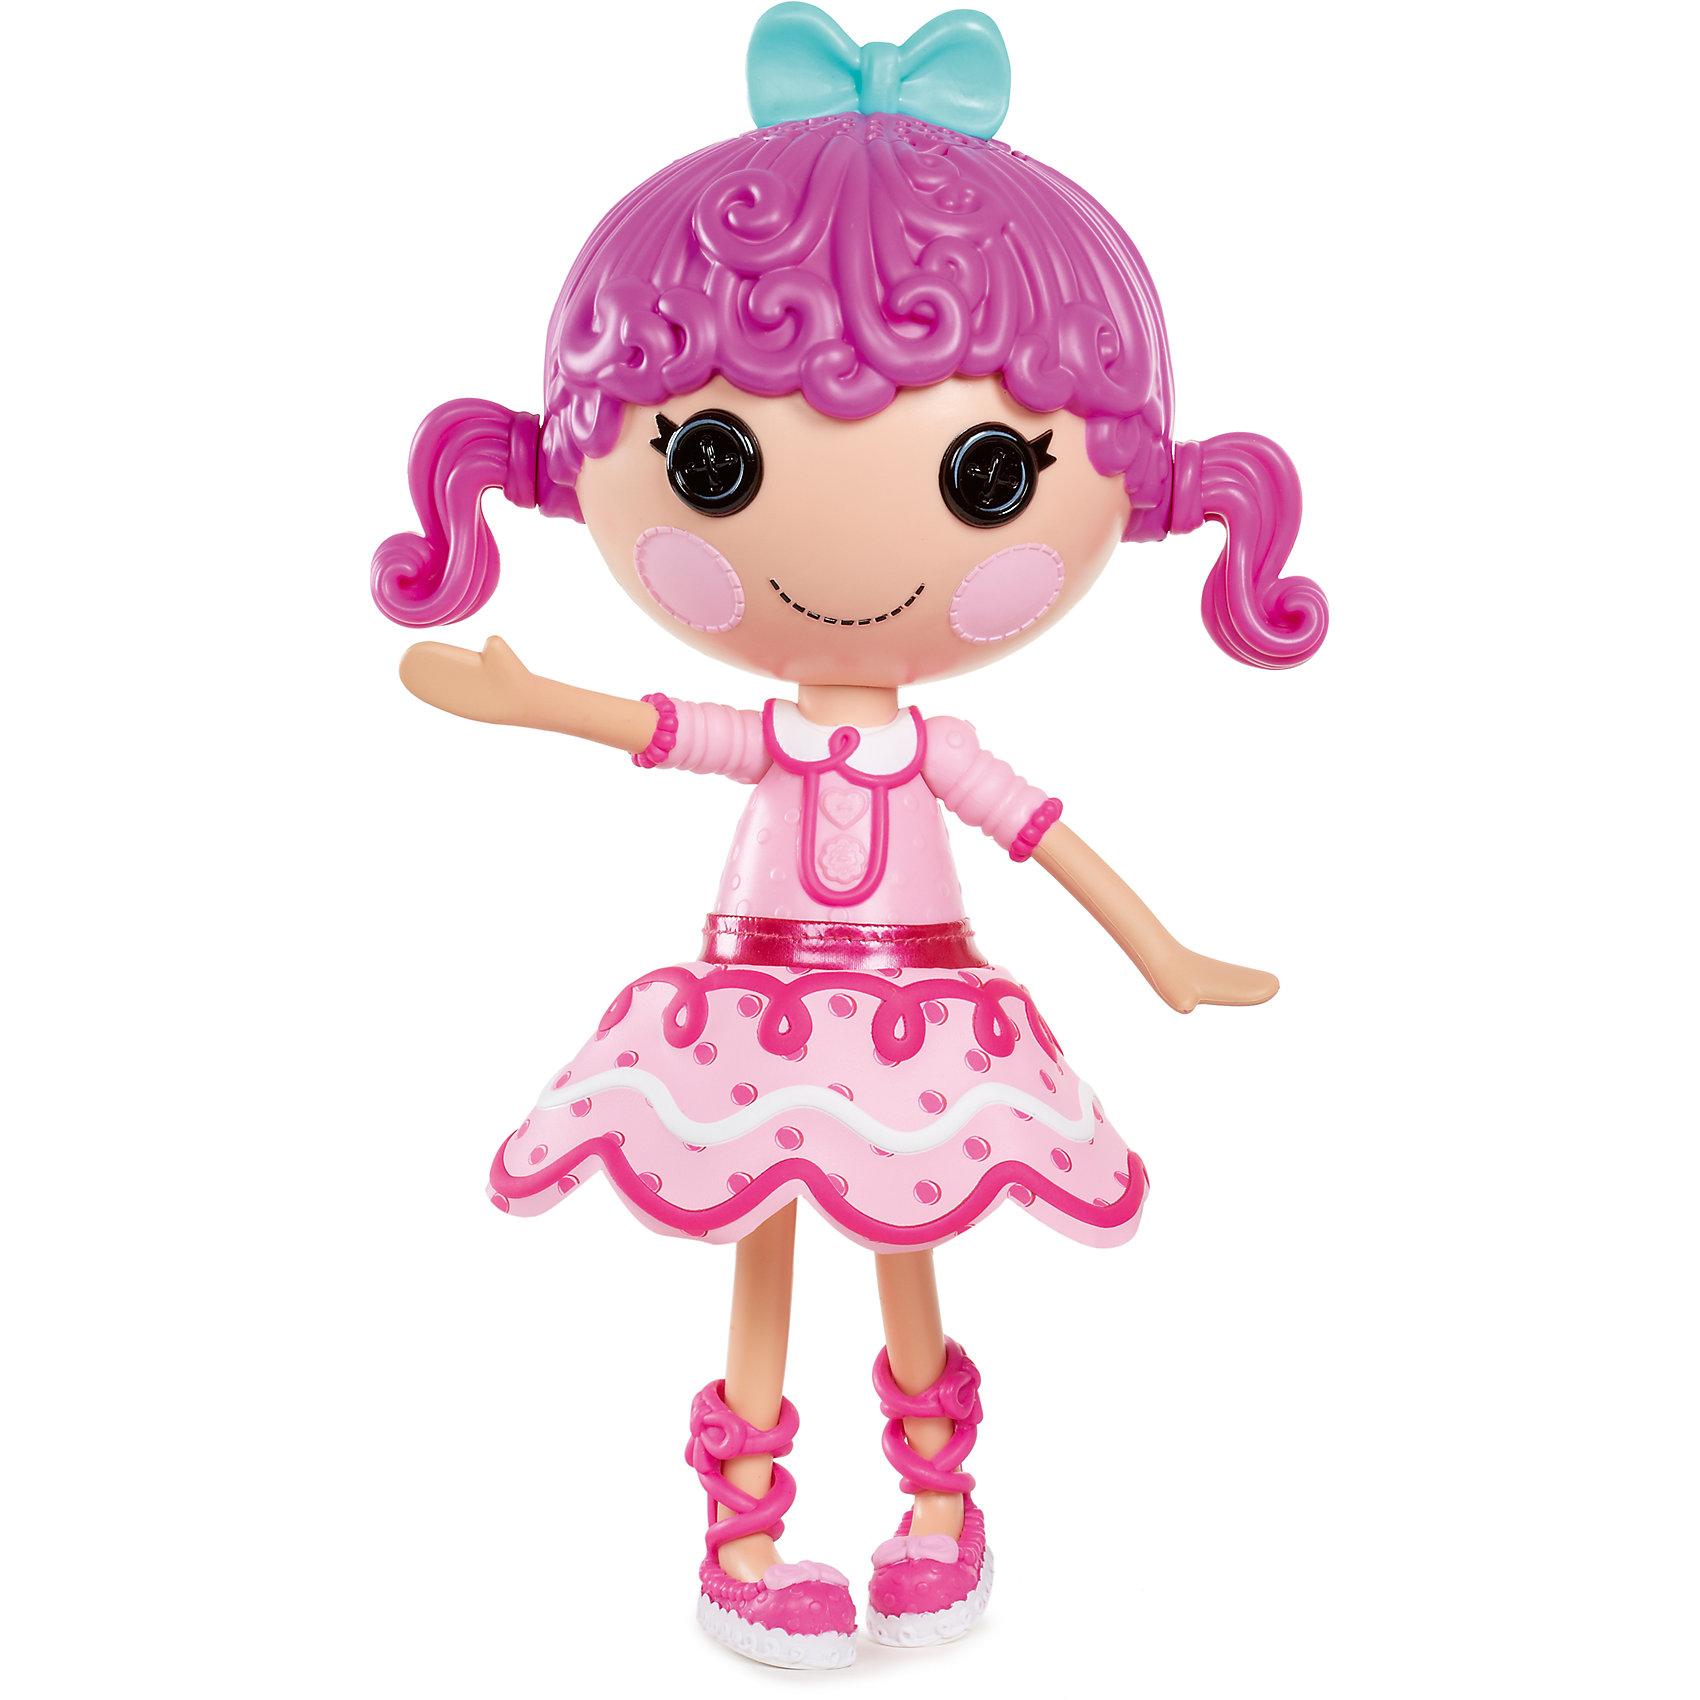 Кукла c волосами из теста, Лалалупси<br><br>Ширина мм: 320<br>Глубина мм: 380<br>Высота мм: 140<br>Вес г: 1740<br>Возраст от месяцев: 36<br>Возраст до месяцев: 2147483647<br>Пол: Женский<br>Возраст: Детский<br>SKU: 5100198